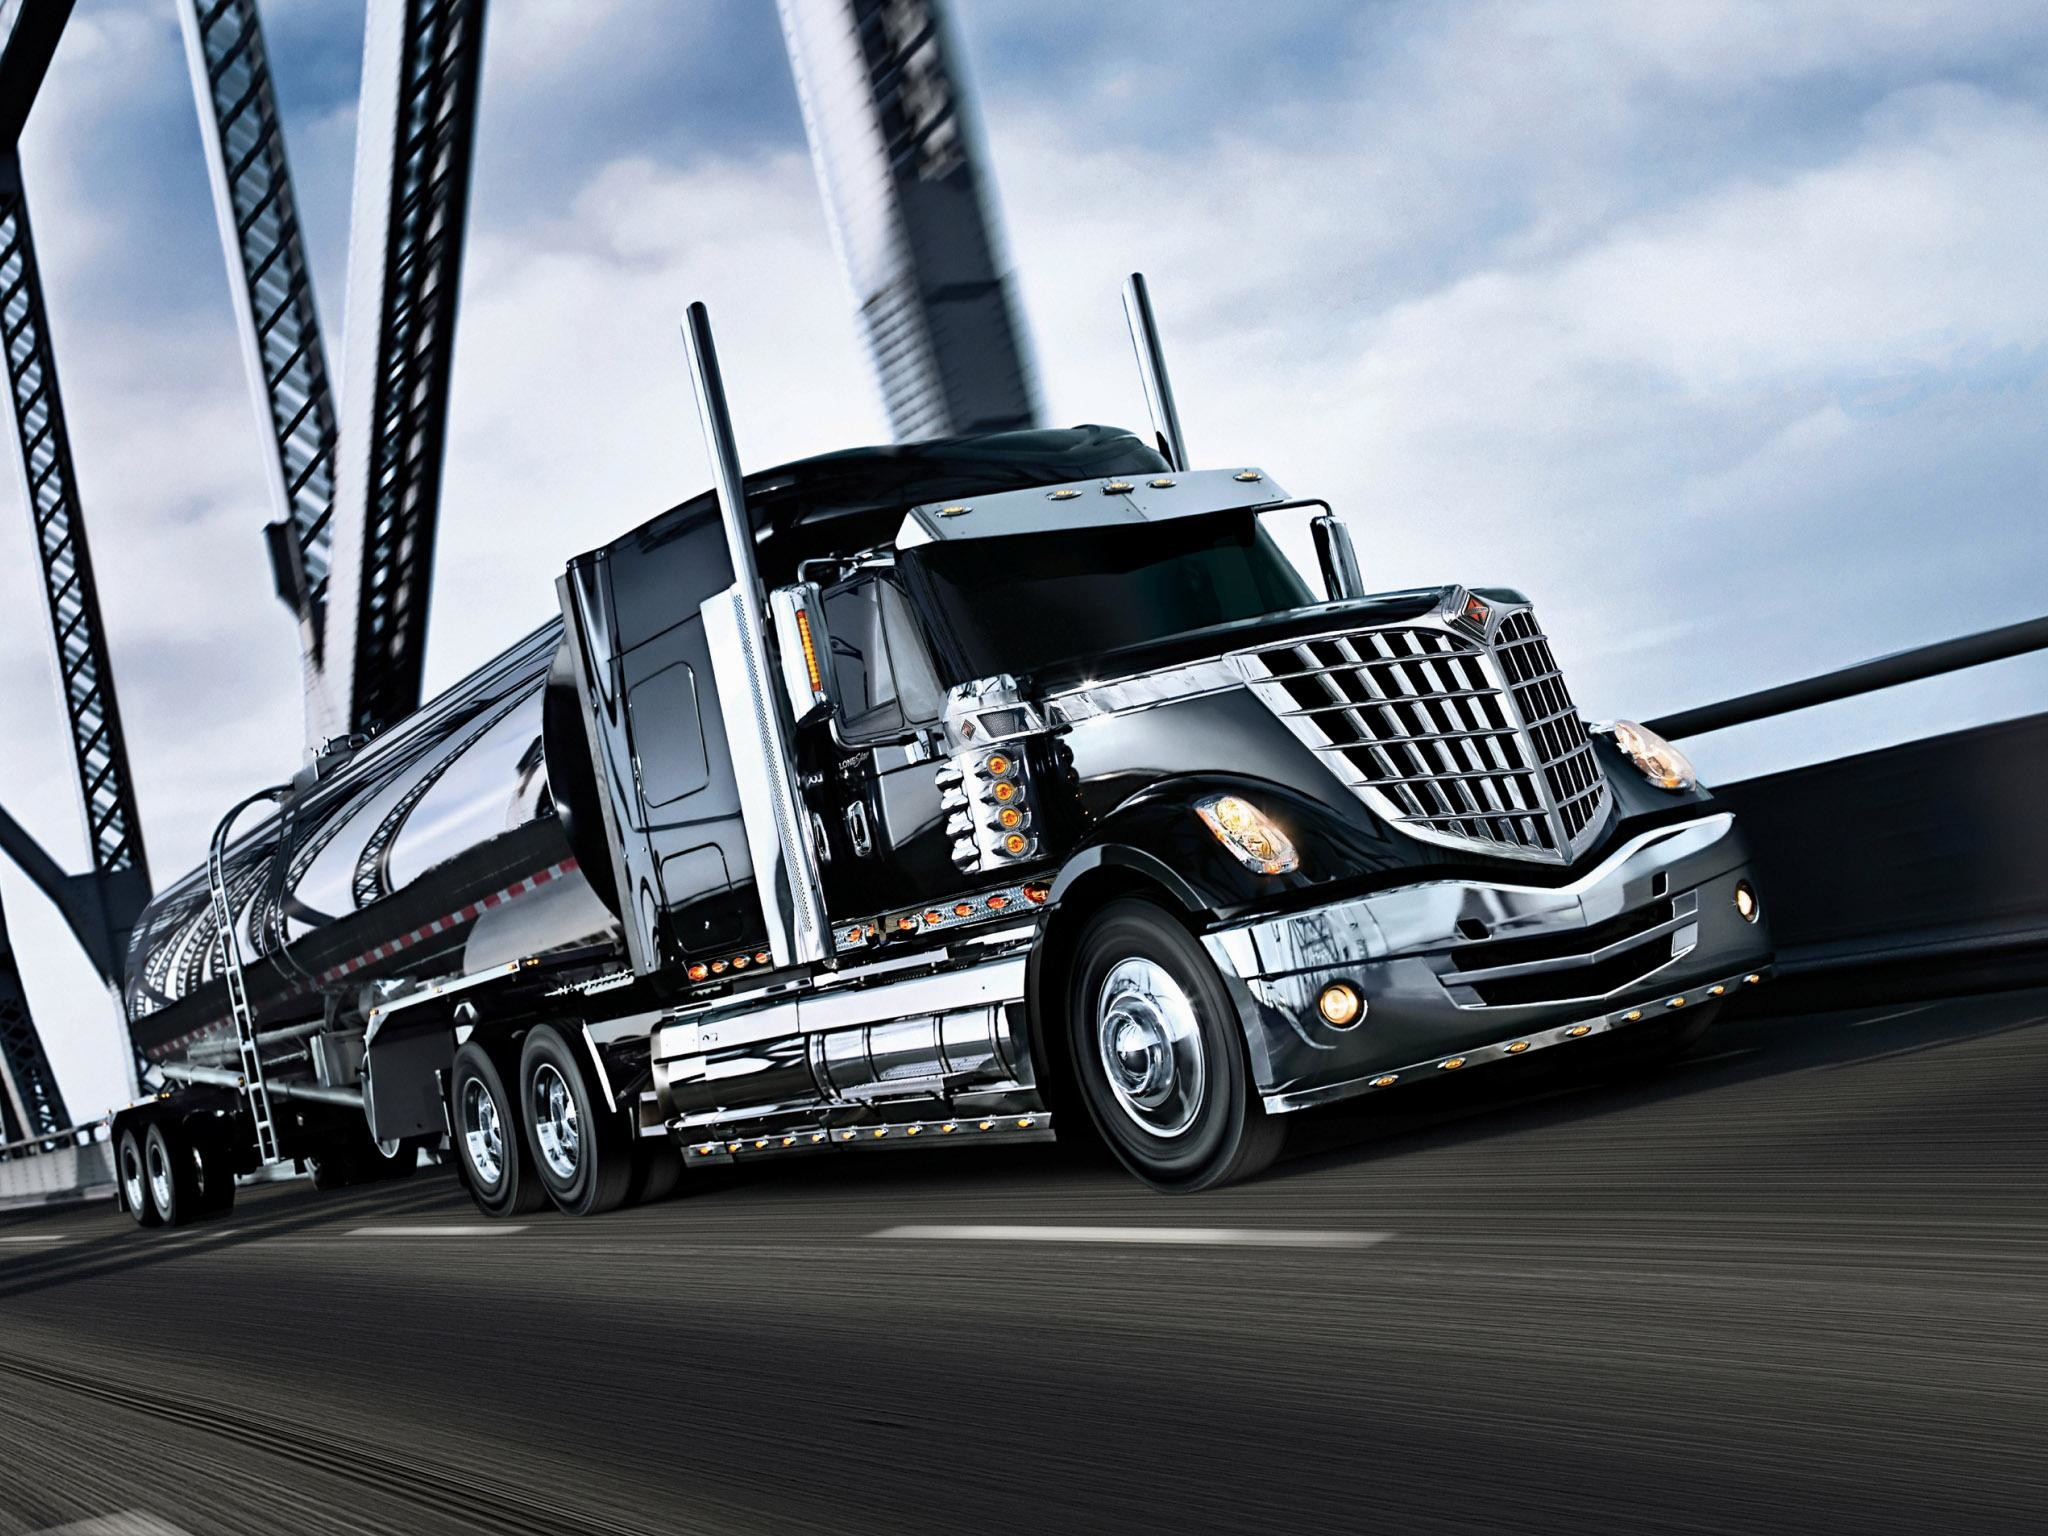 wallpaper.wiki-Semi-Truck-Wallpaper-Free-Download-PIC-